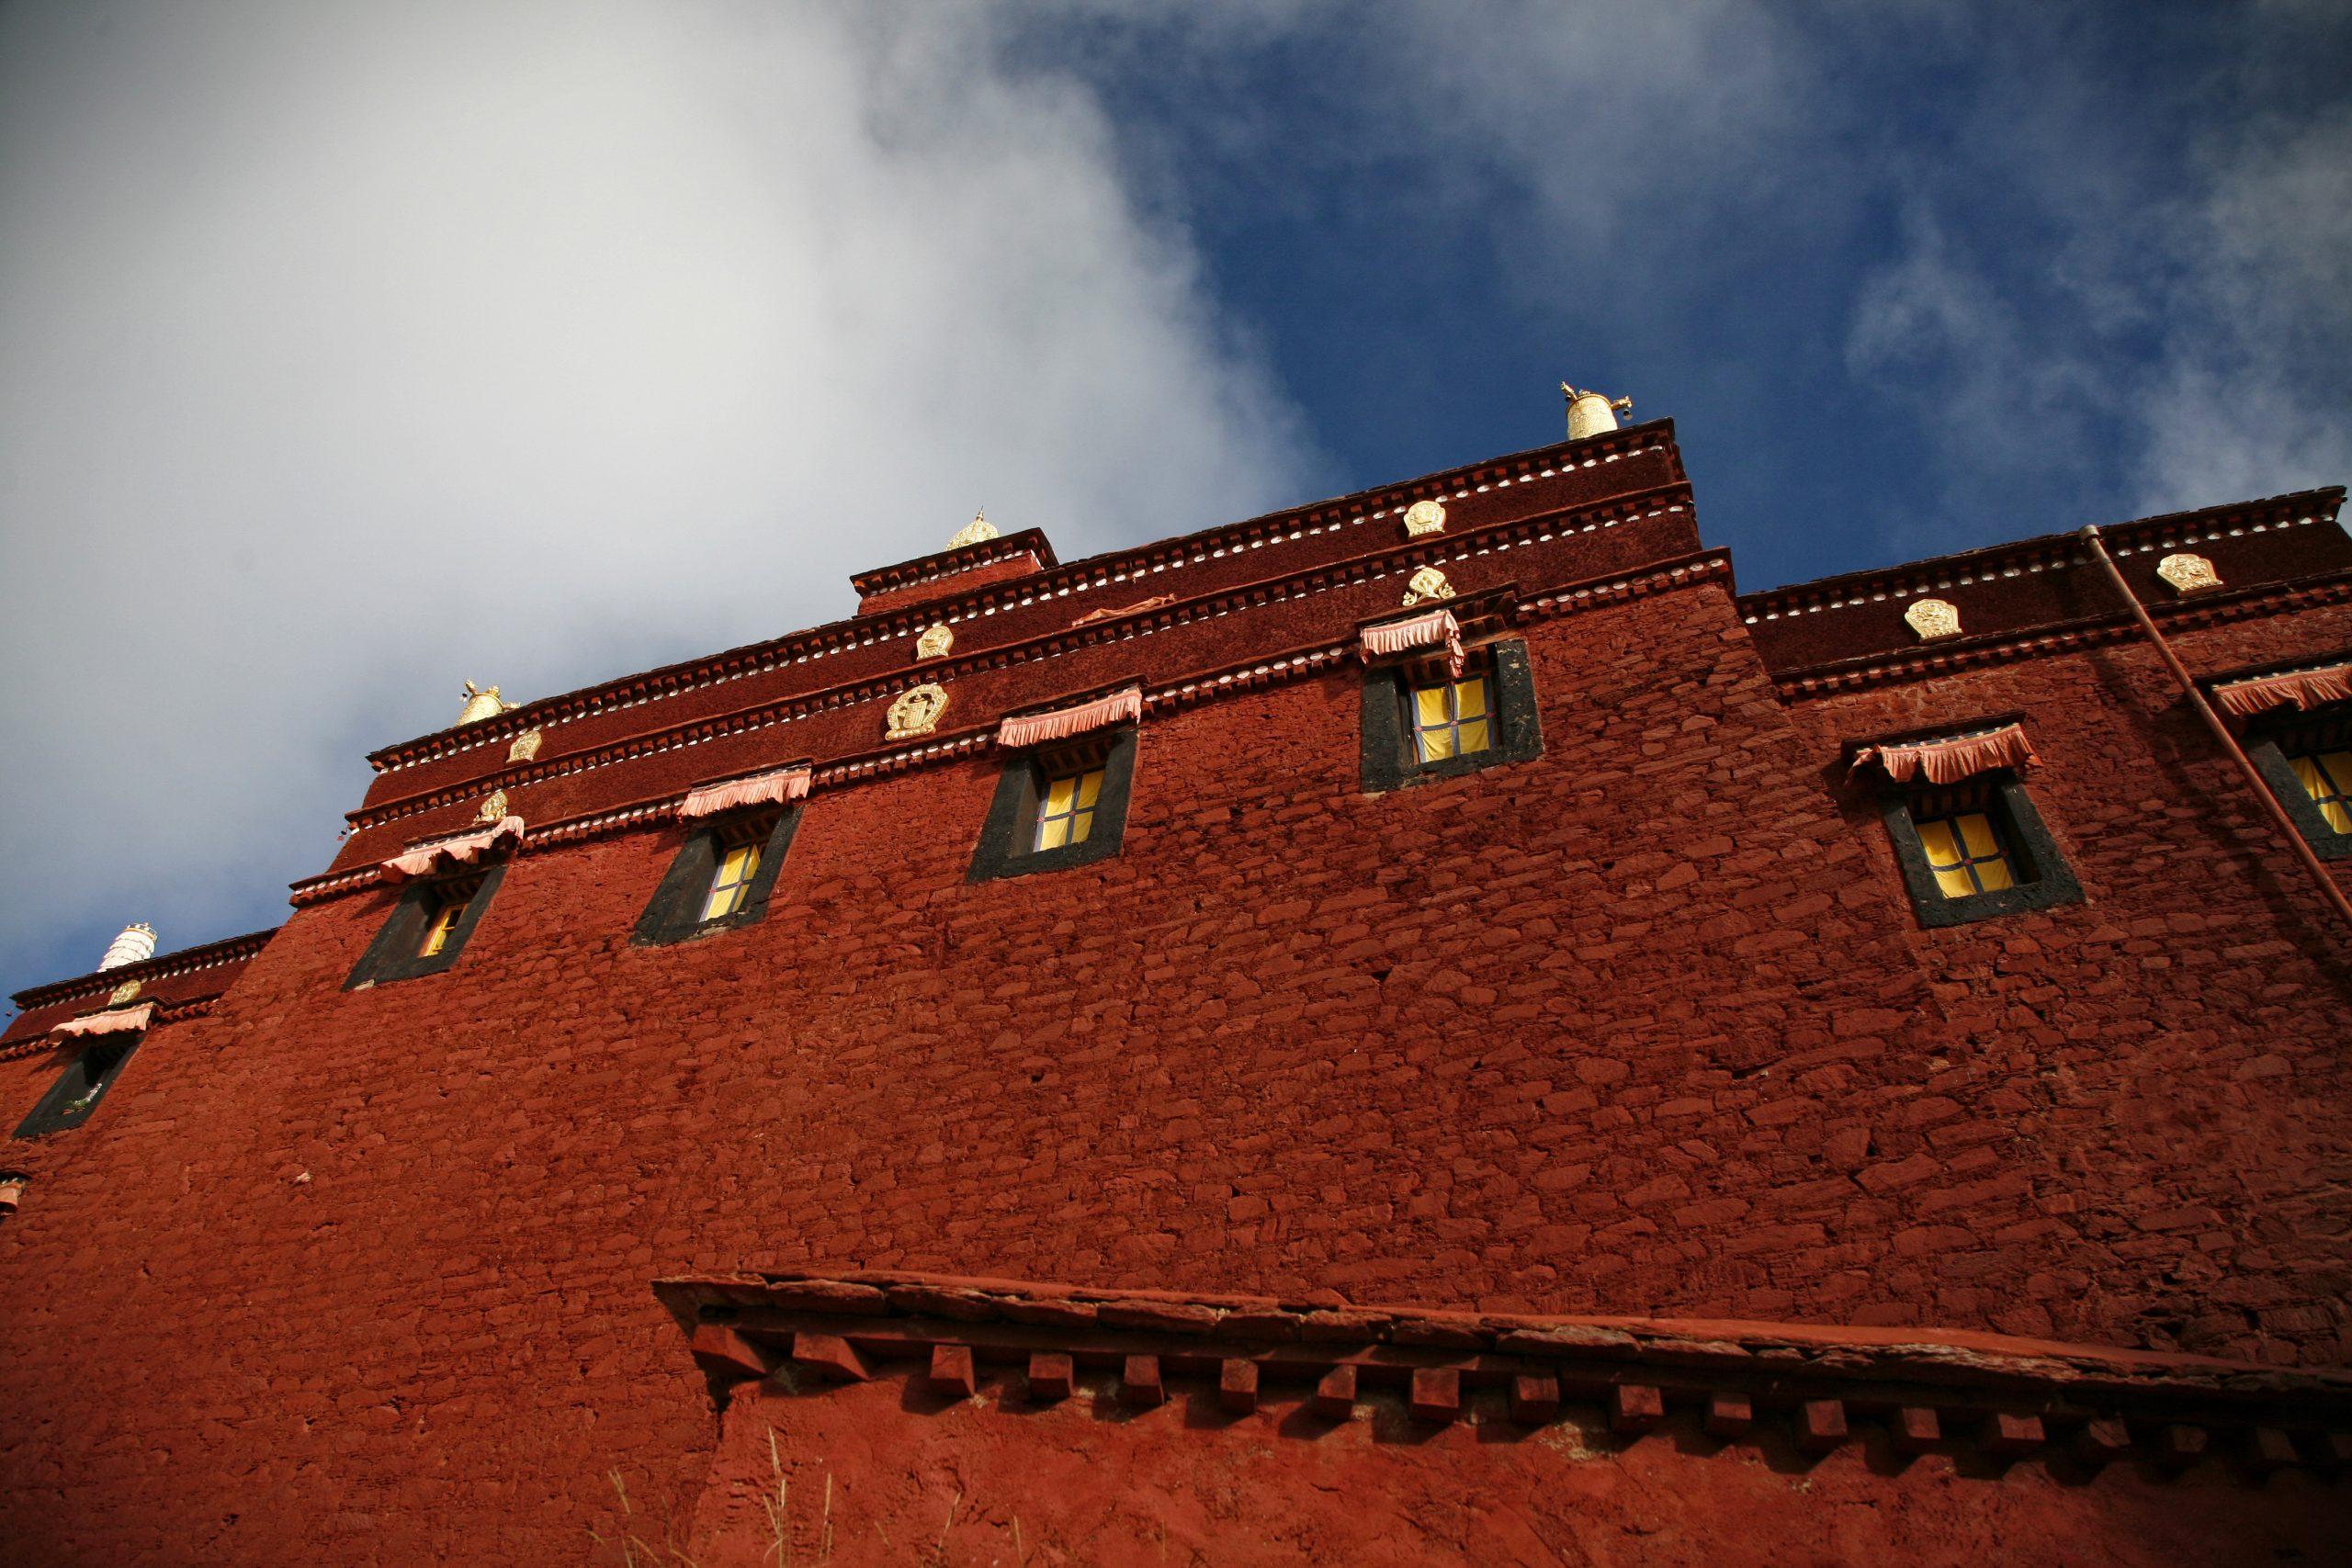 Cristiano Lissoni, Tibet, Polaris Editore